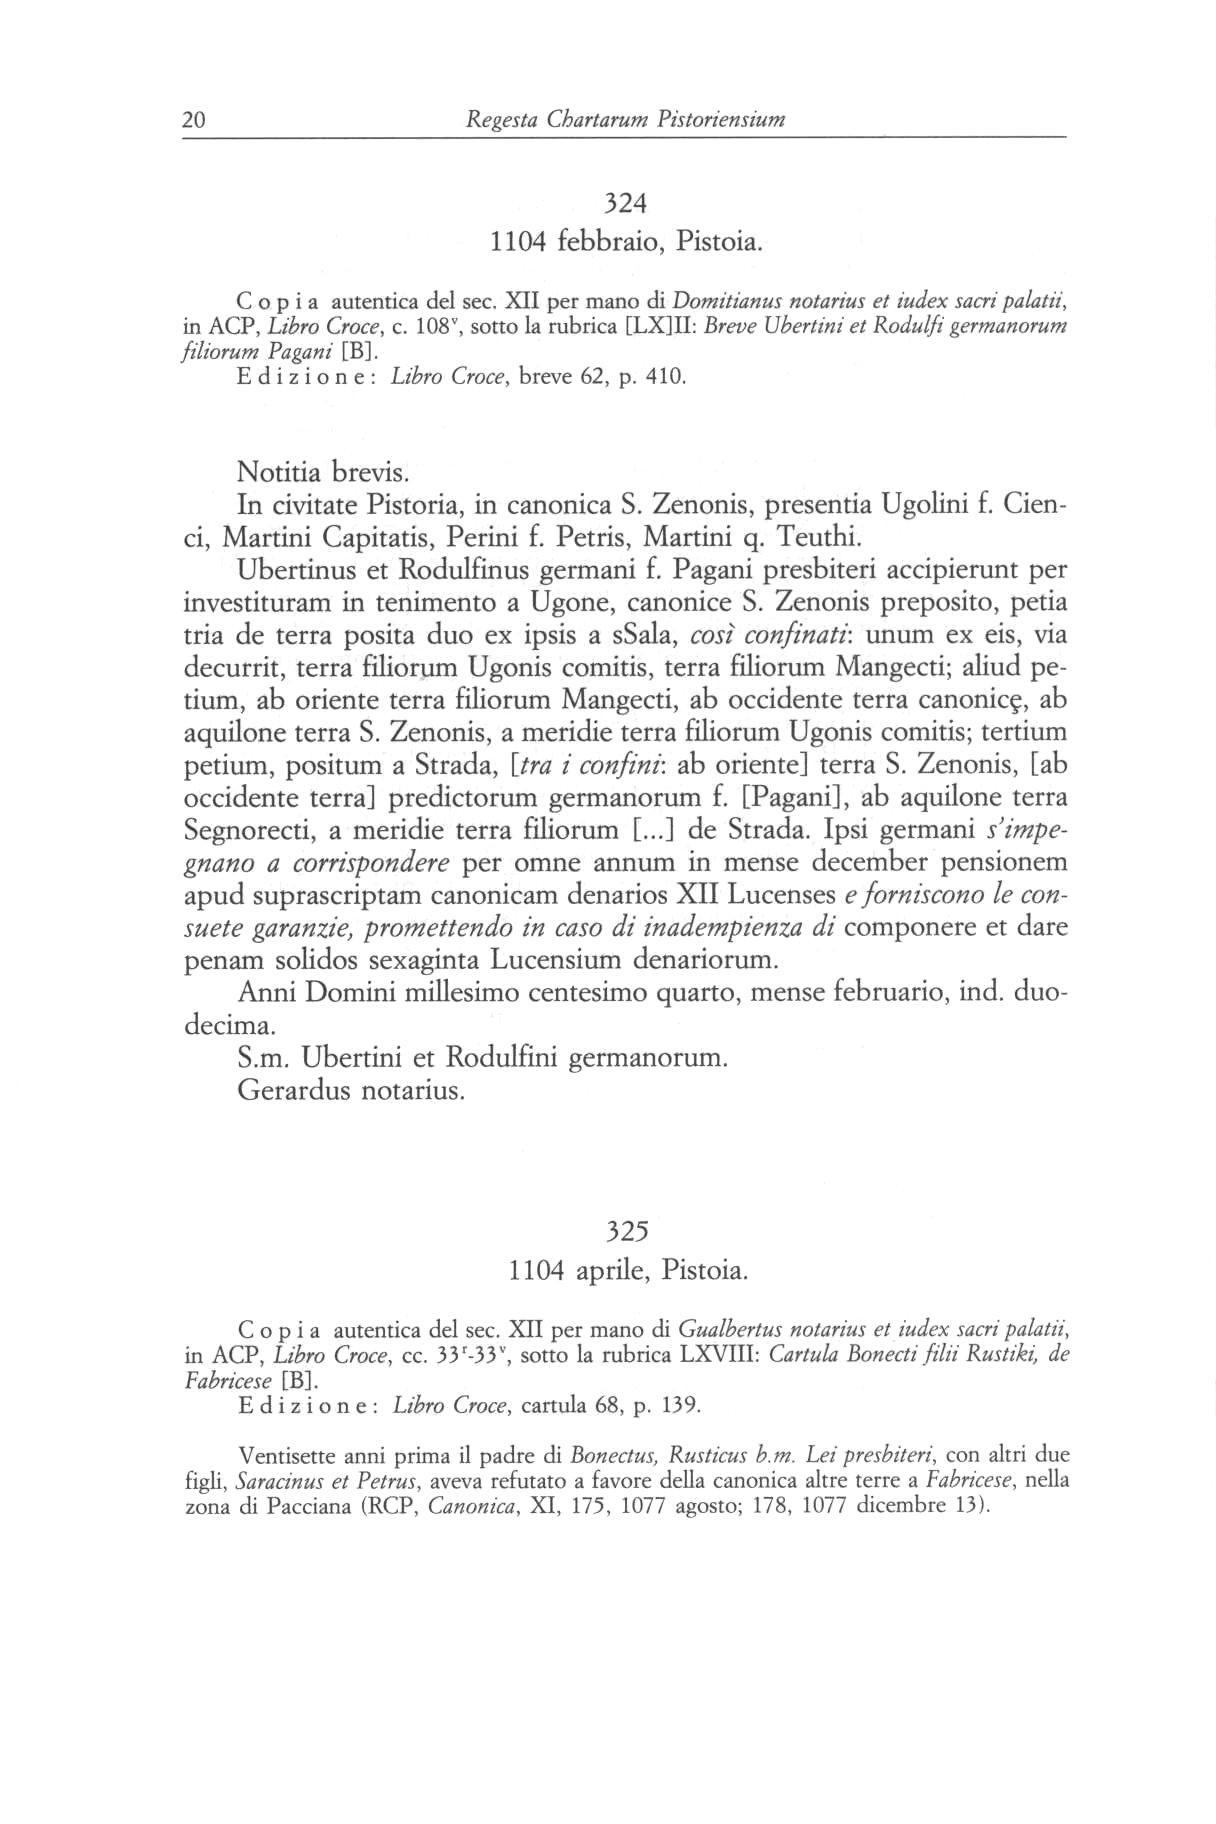 Canonica S. Zenone XII 0020.jpg